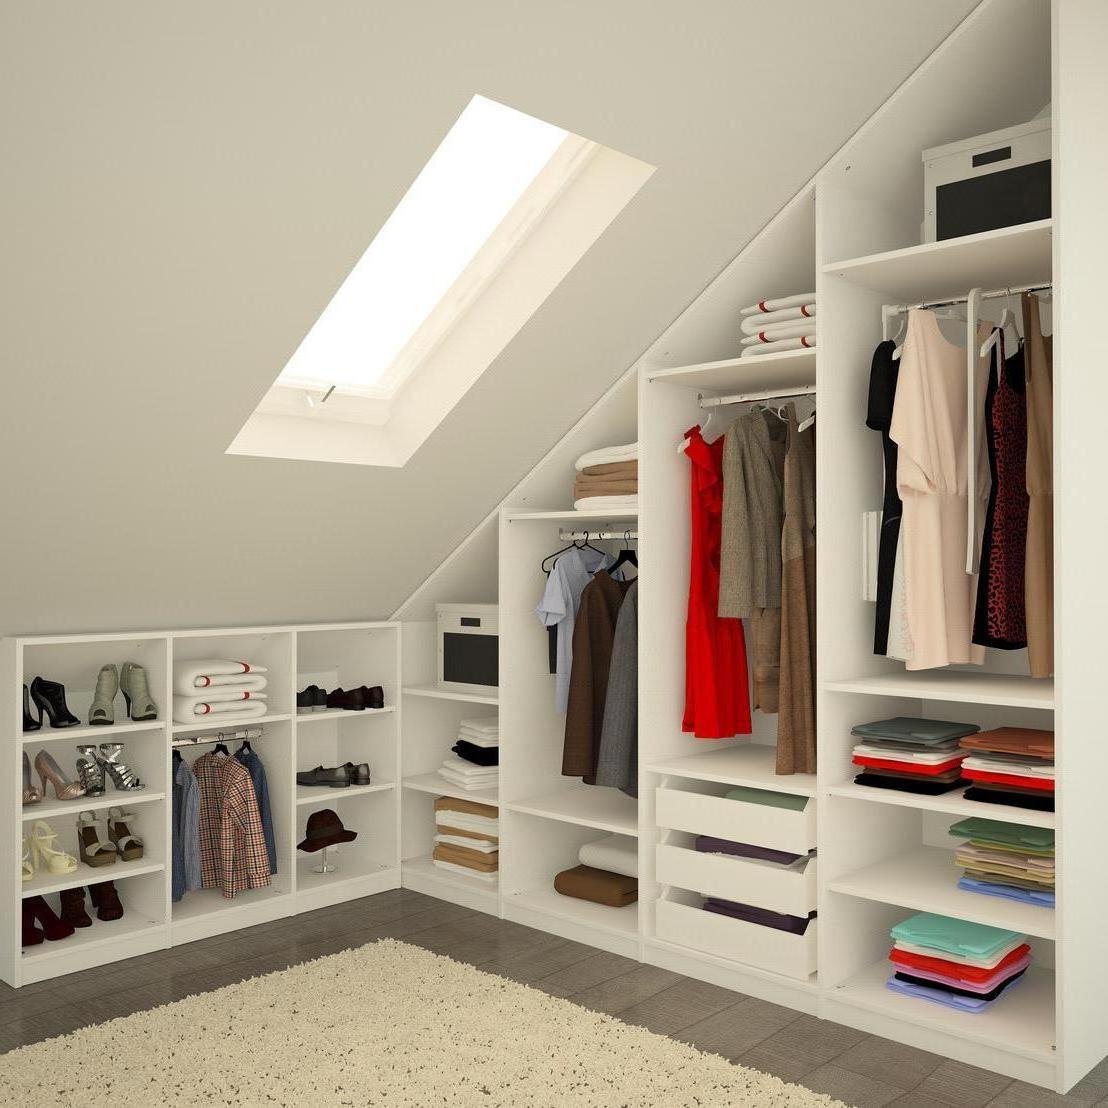 attic-bedroom-closet-ideas-photo-8